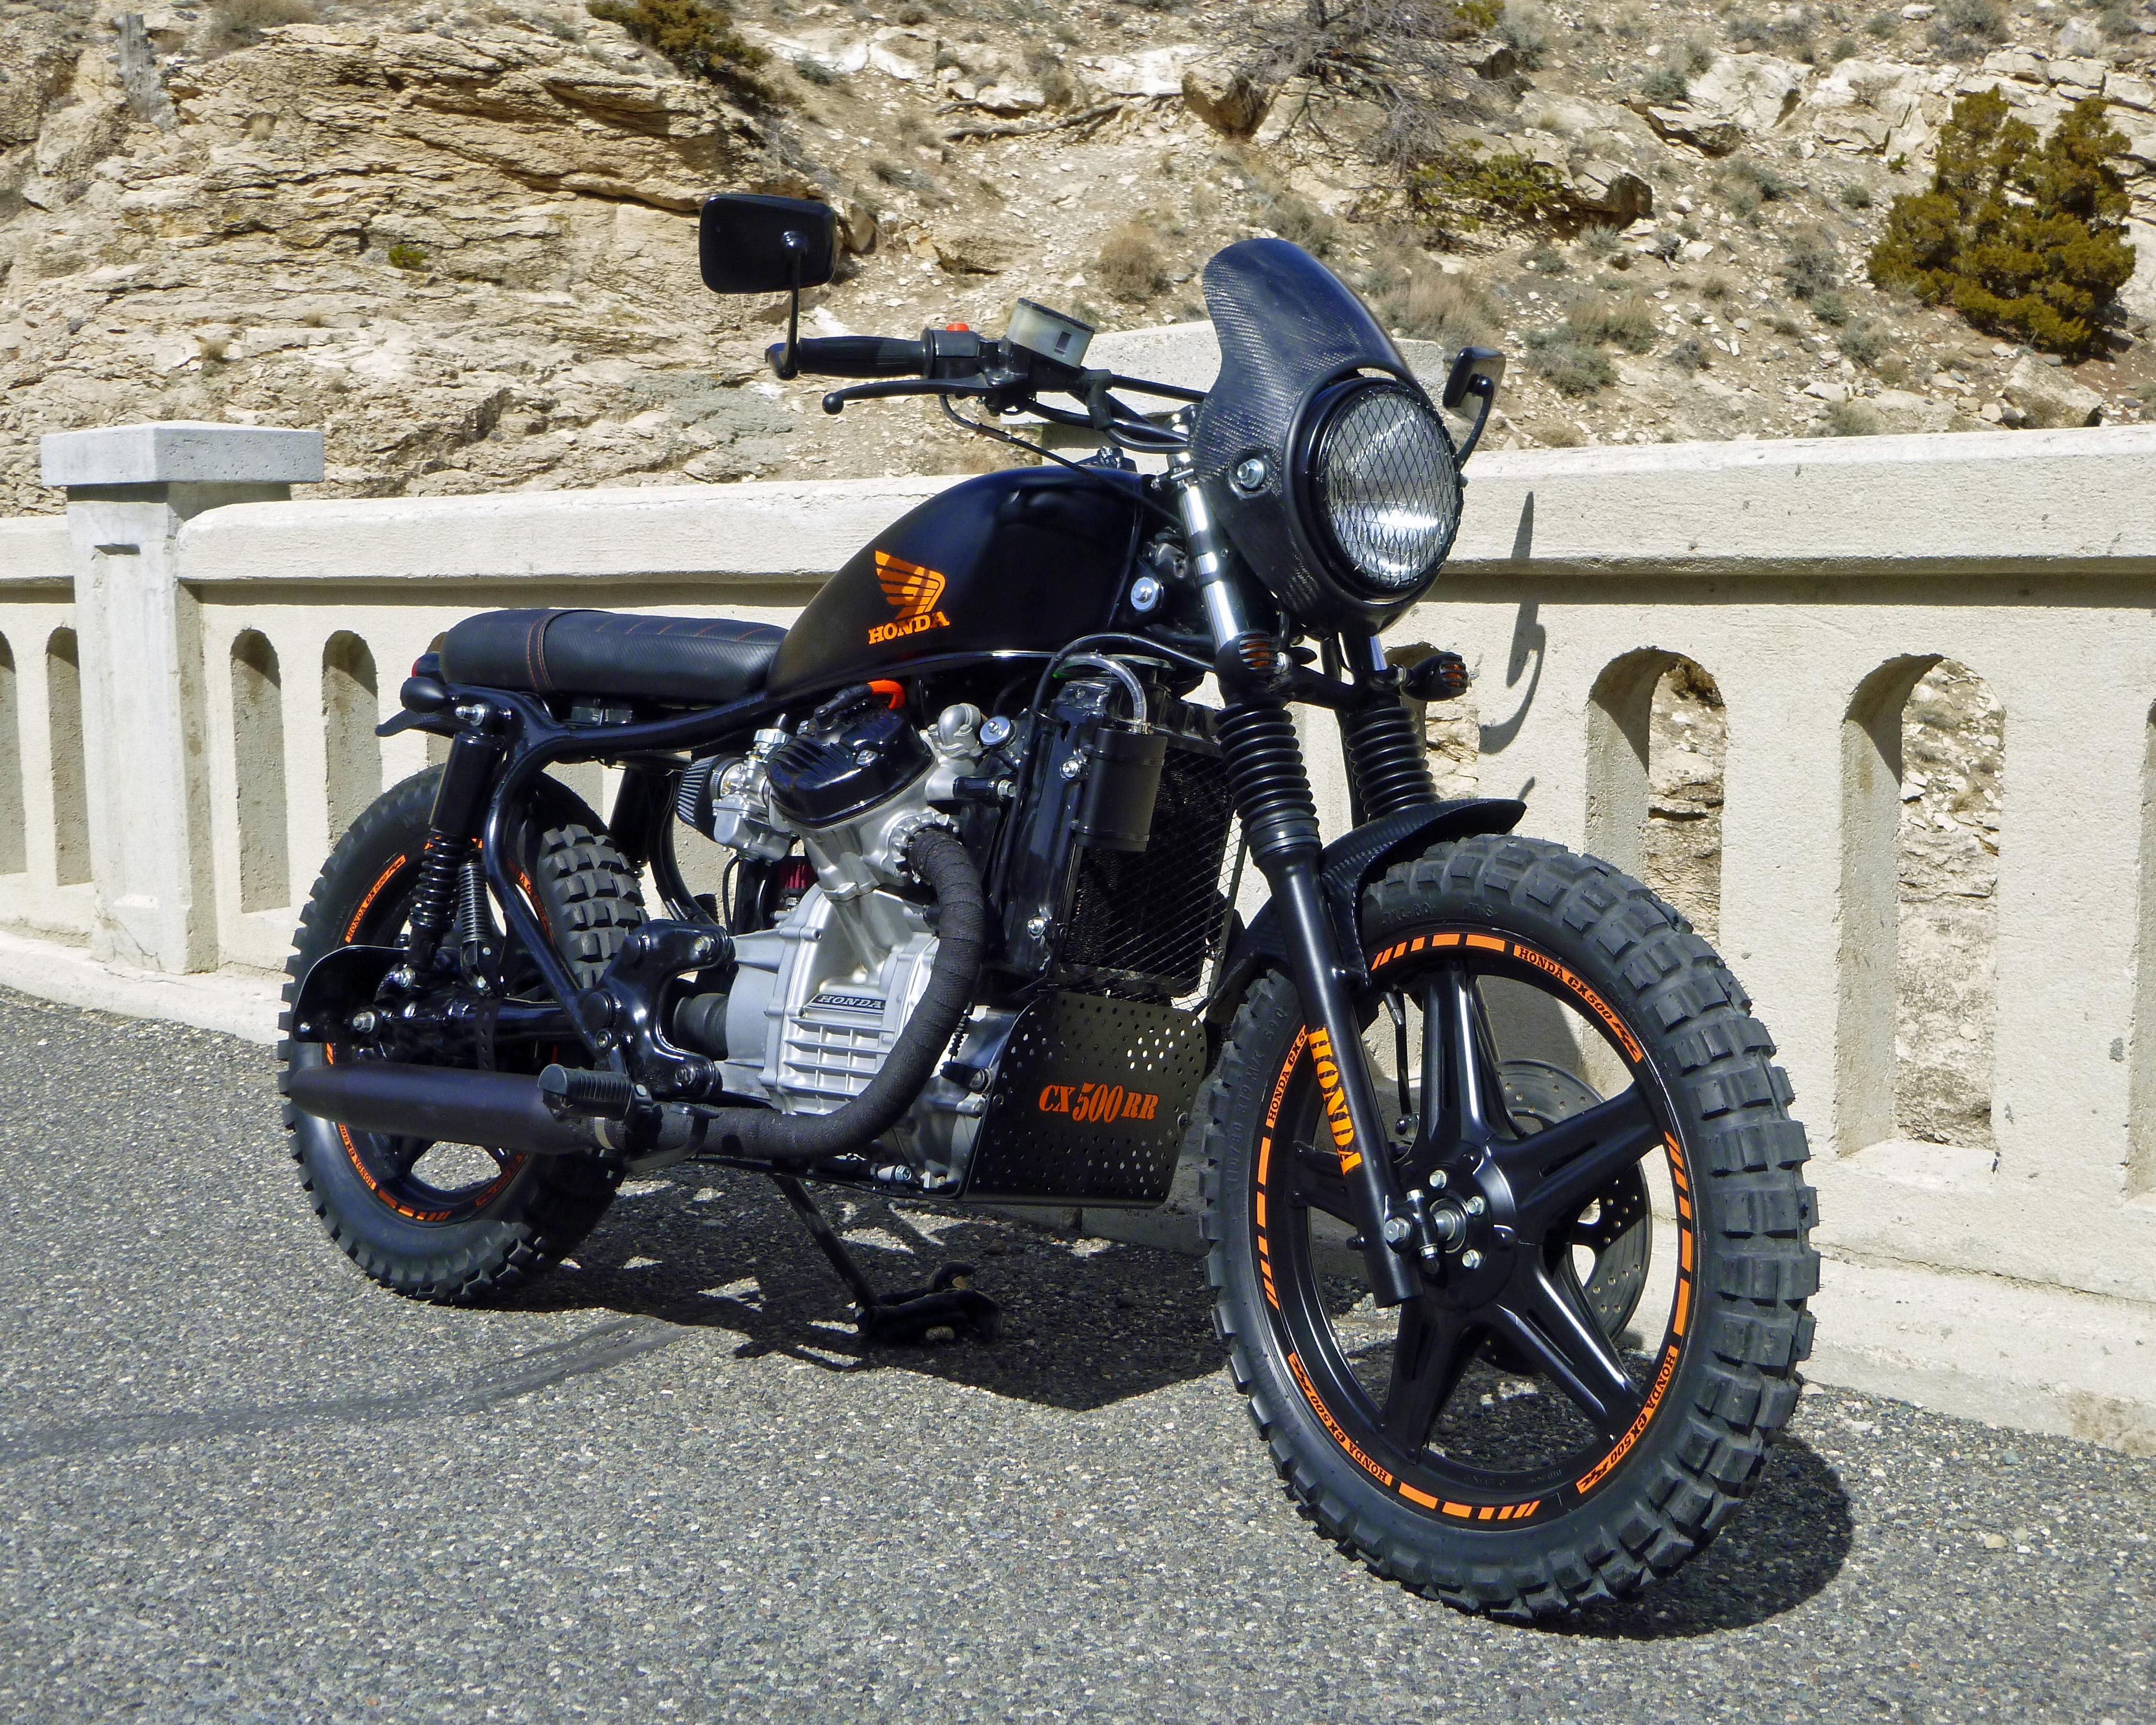 Honda Cx500 For Sale >> 82 CX 500 RR Street Tracker, Custom Brat Style bike Must ...